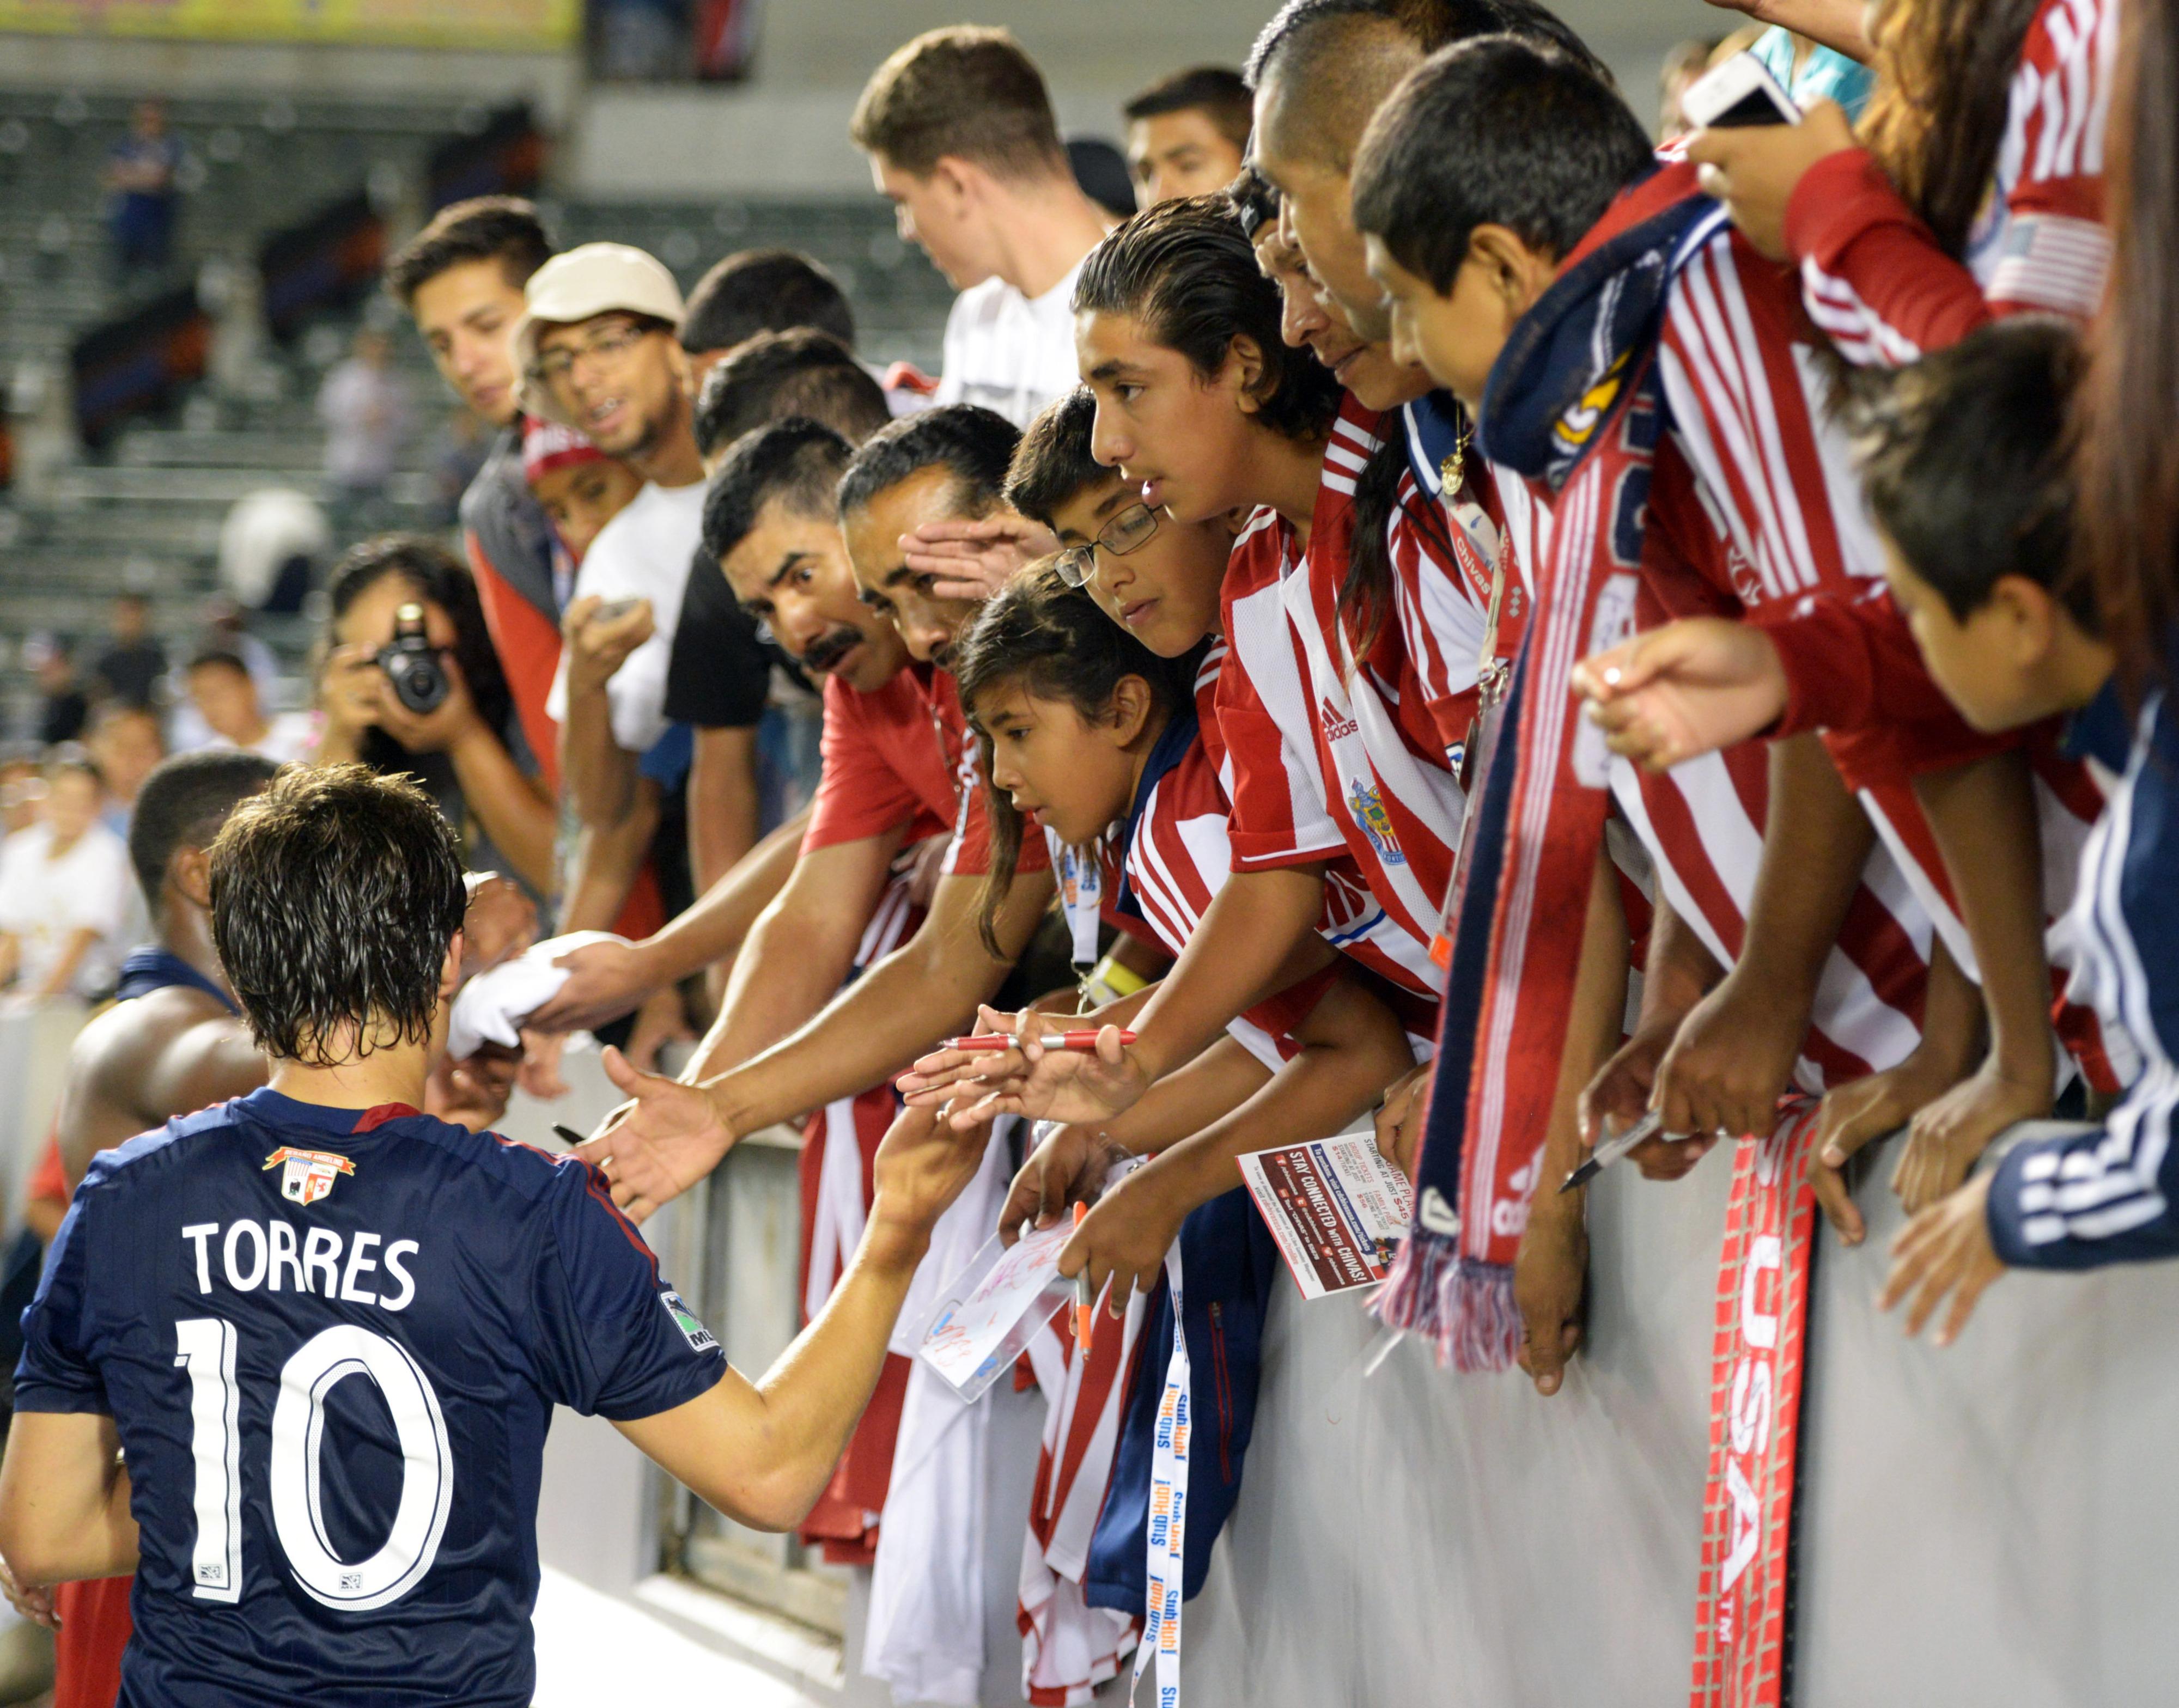 Cubo Torres greets fans